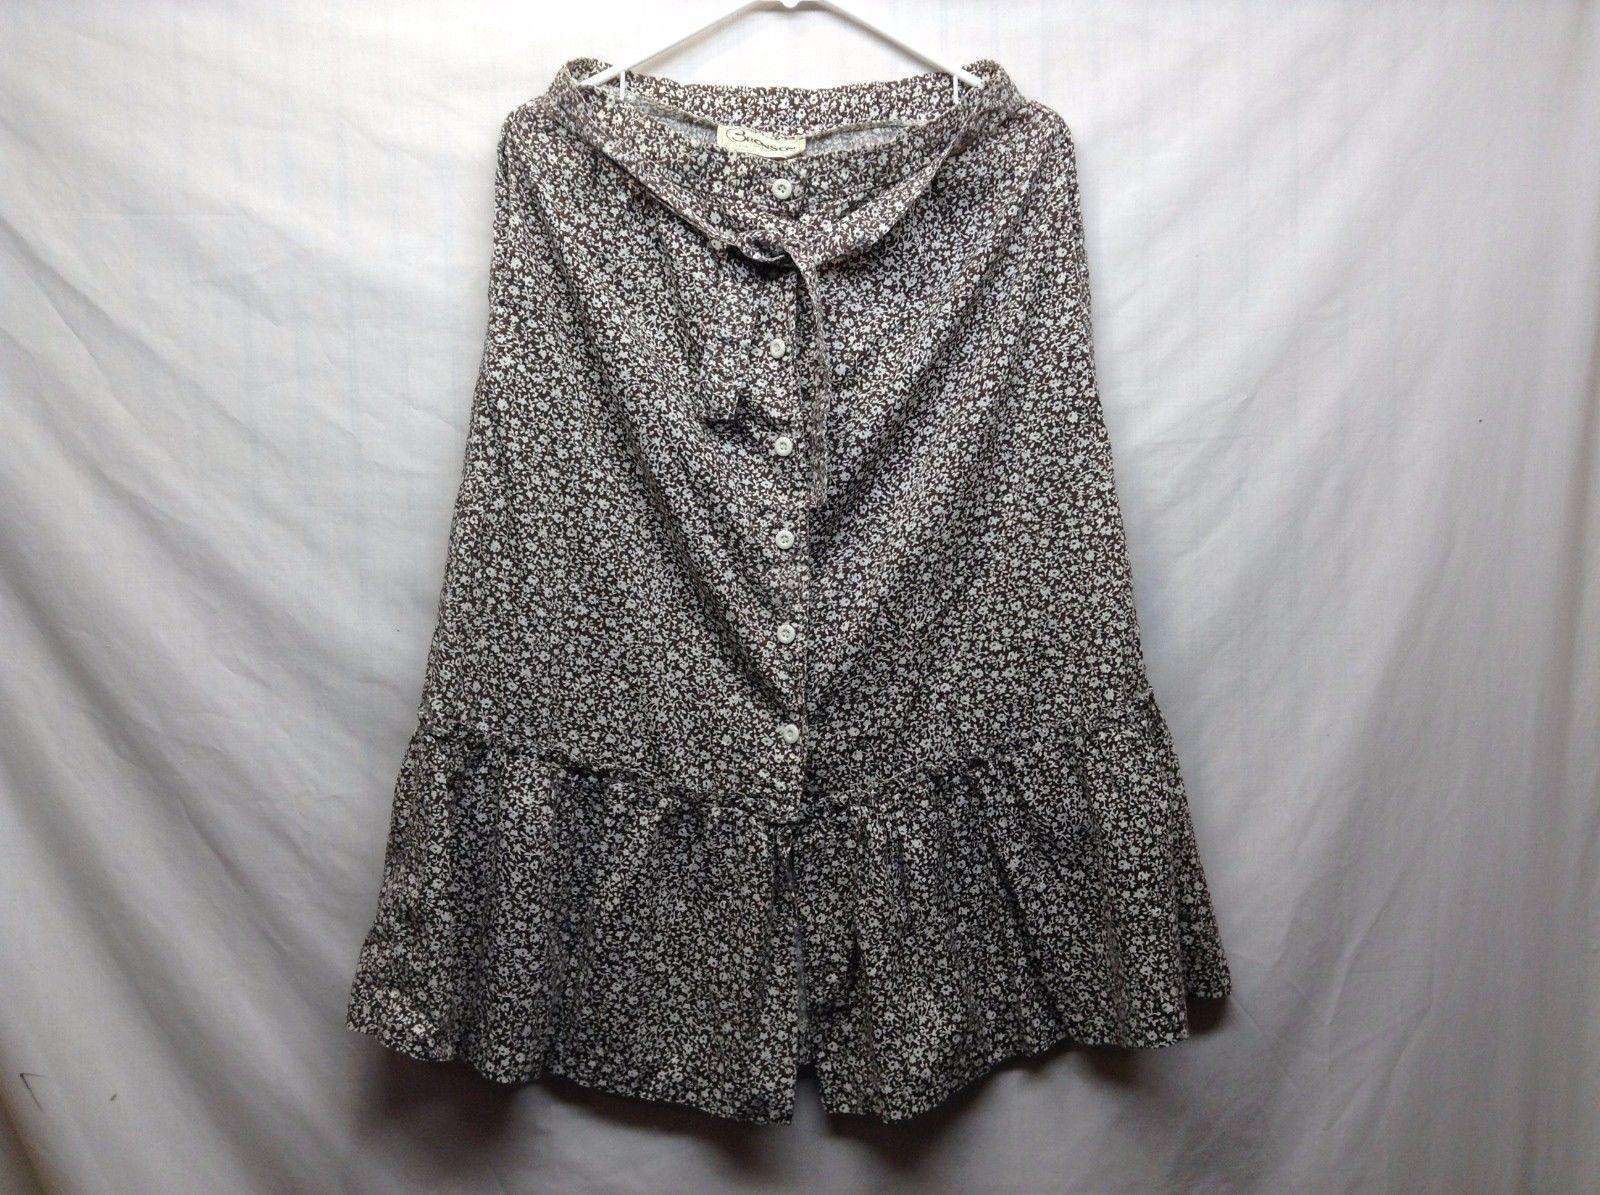 Bronson of California Brown w White Floral Design Skirt Sz 13-14